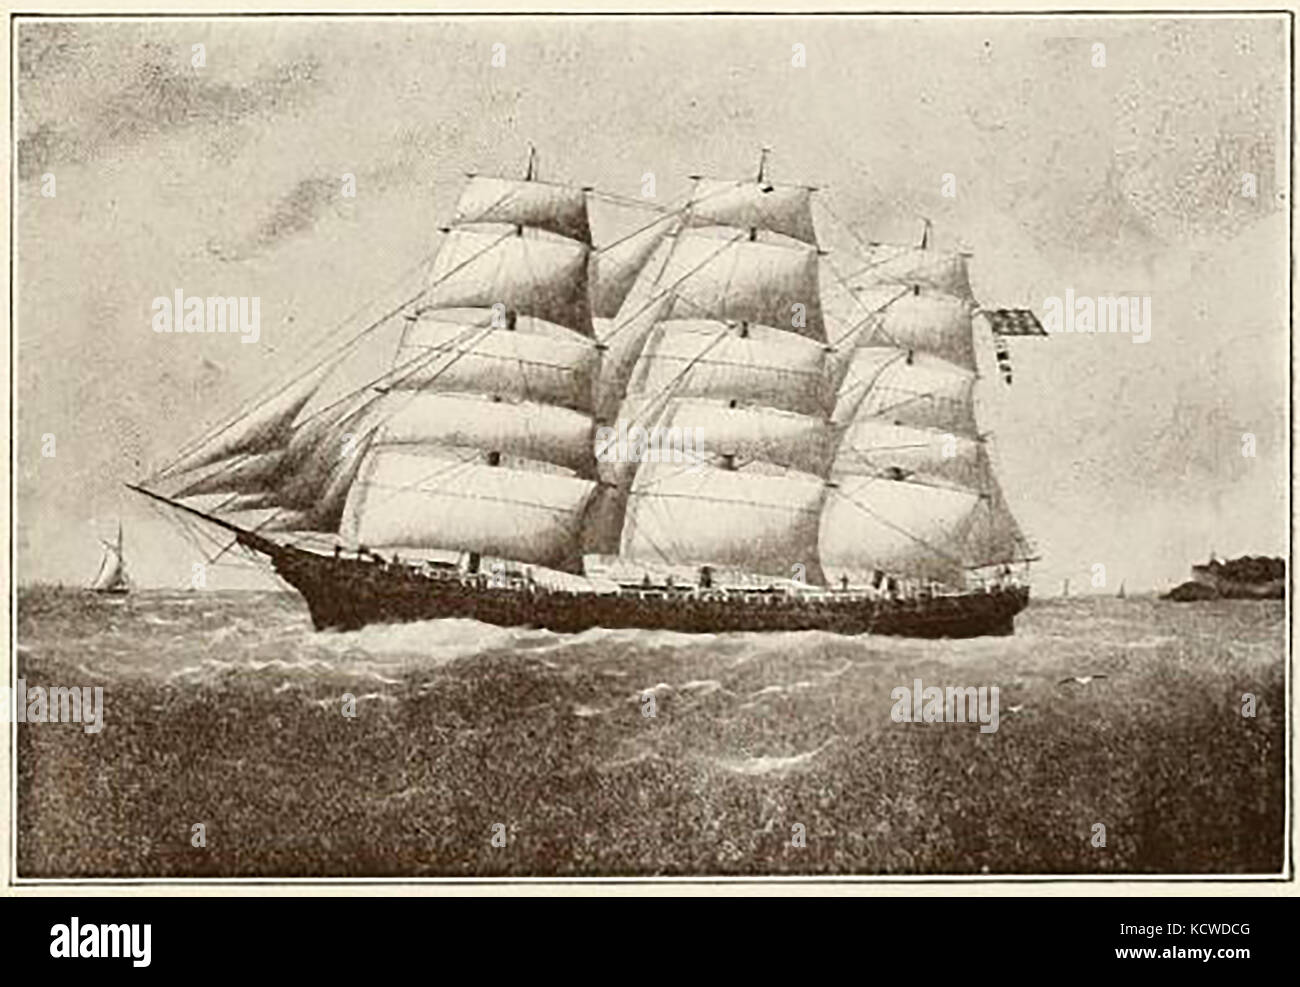 The 1687 ton , triple decked US ship DANIEL I. TENNEY - Built Newburyport 1875 - Stock Image